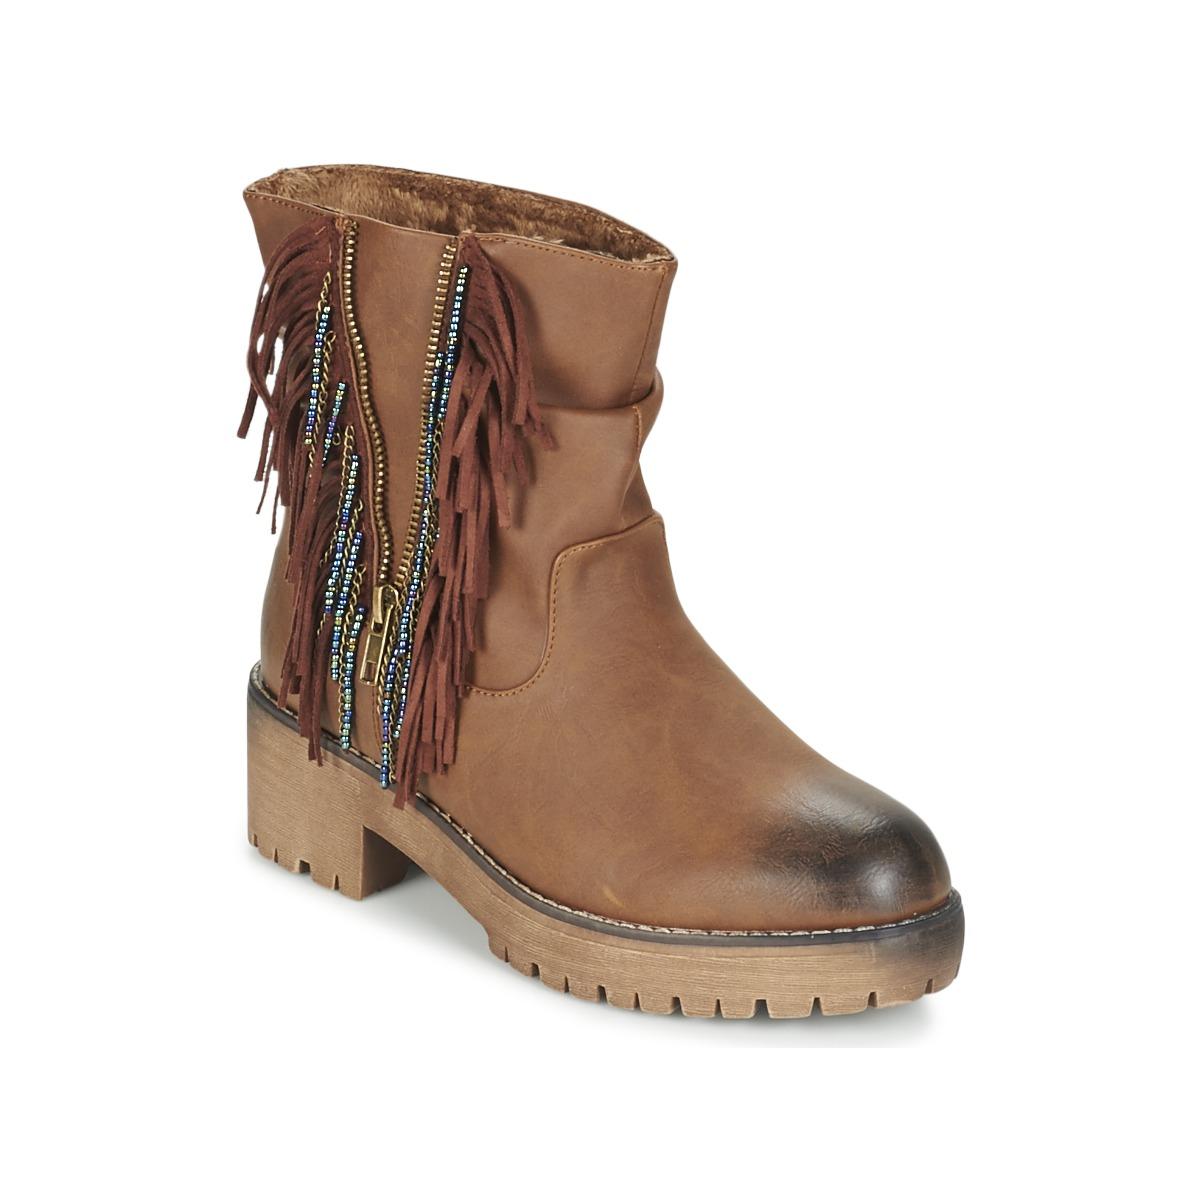 Coolway BARINA Camel - Kostenloser Versand bei Spartoode ! - Schuhe Boots Damen 41,39 €